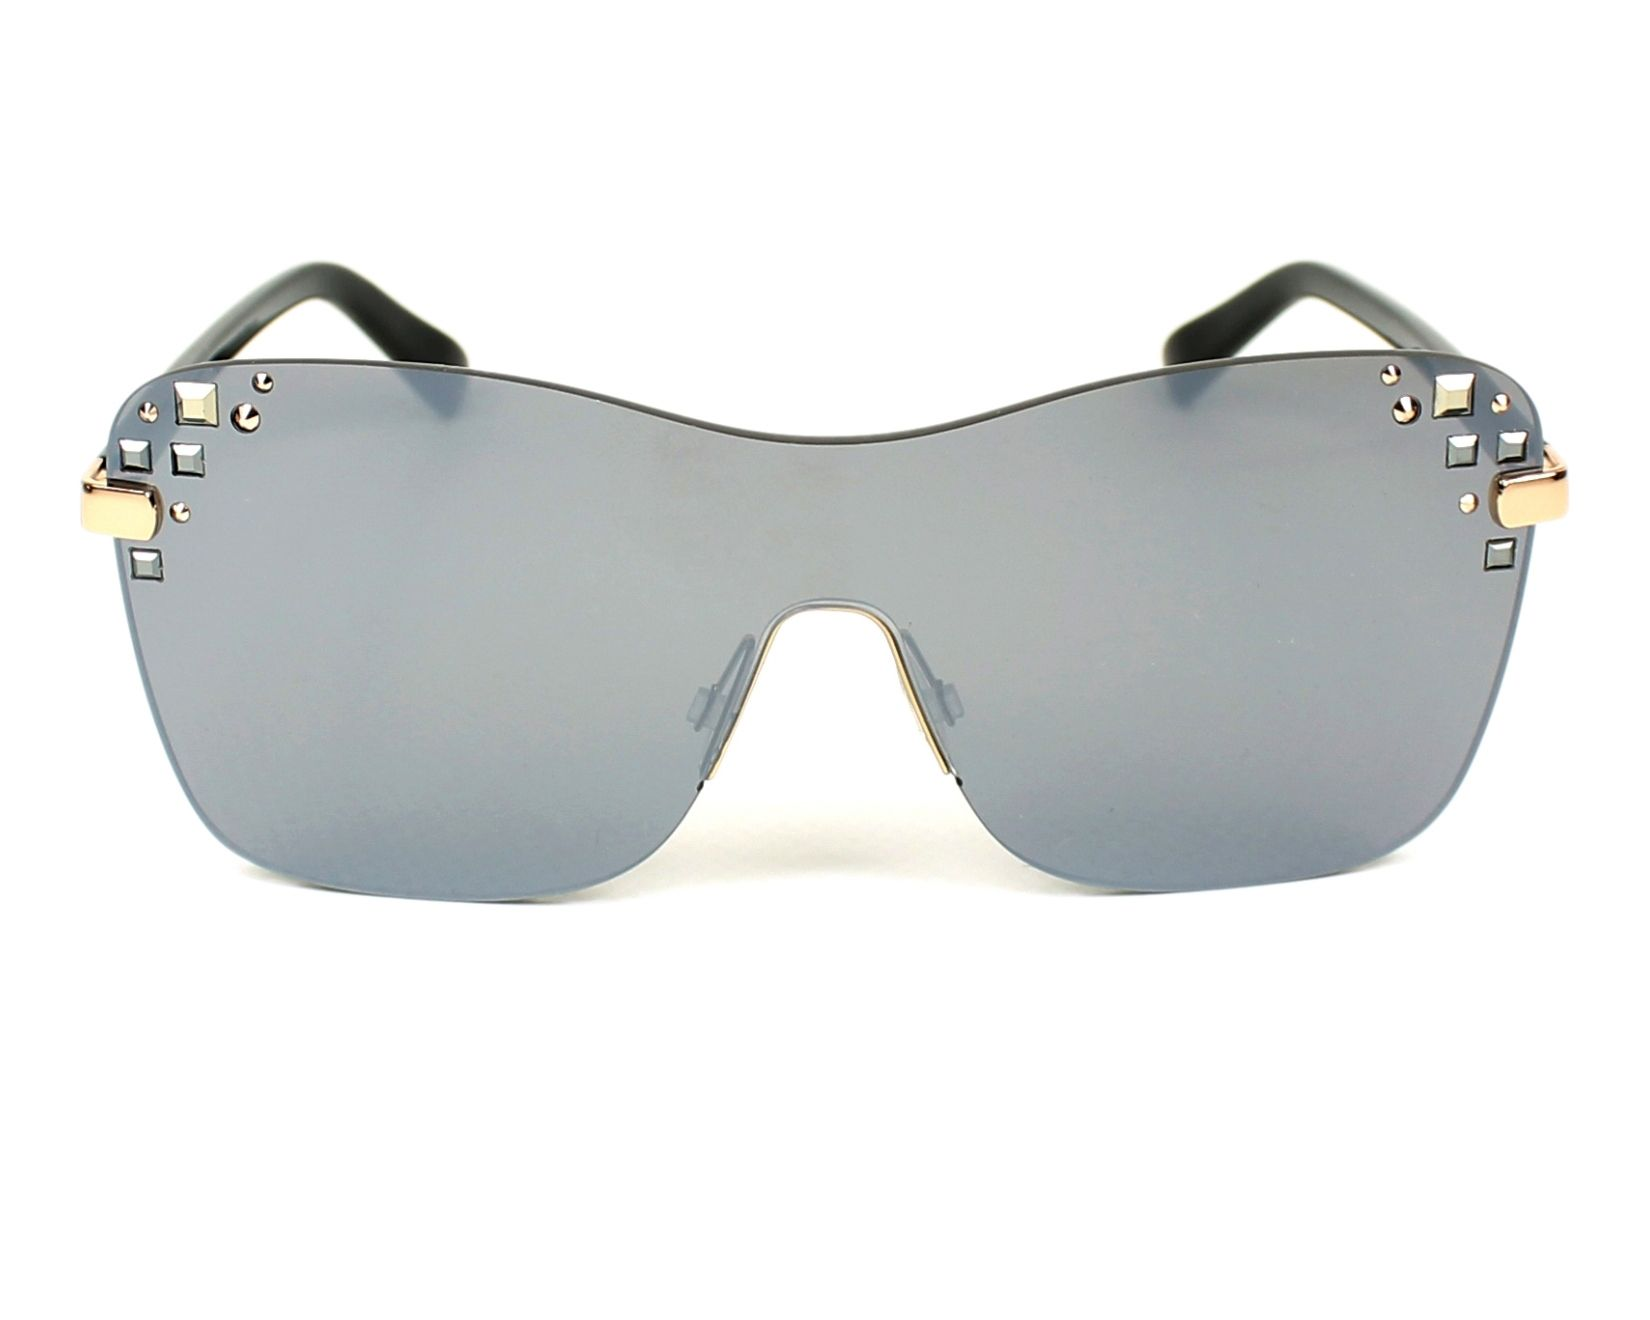 b2b1e67b784 thumbnail Sunglasses Jimmy Choo MASK-S SRF U4 - Black front view